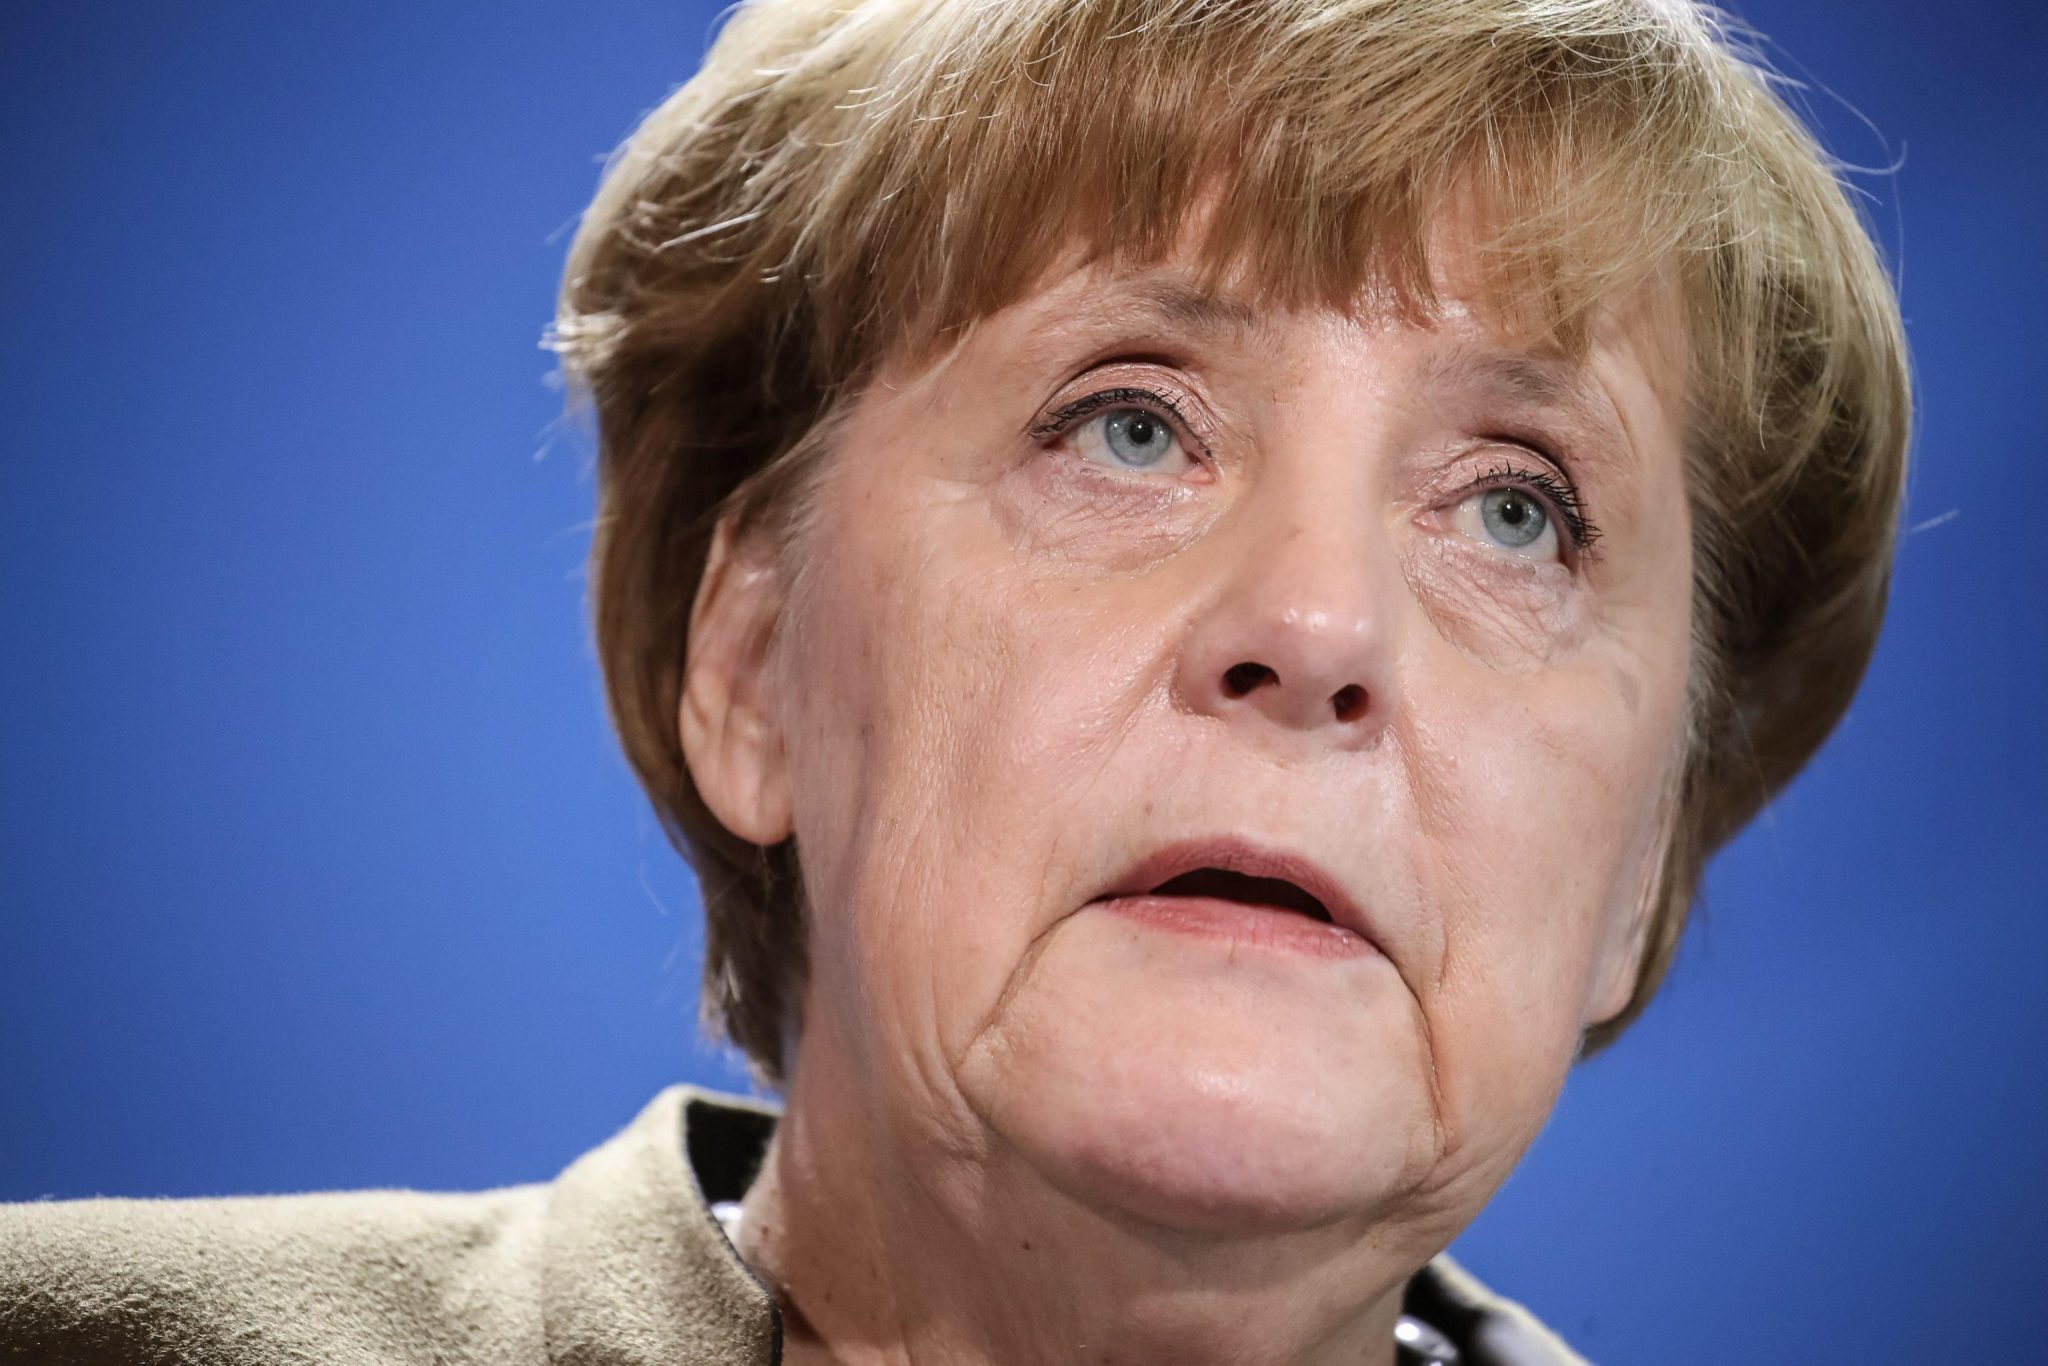 Anis Amri, Angela Merkel: